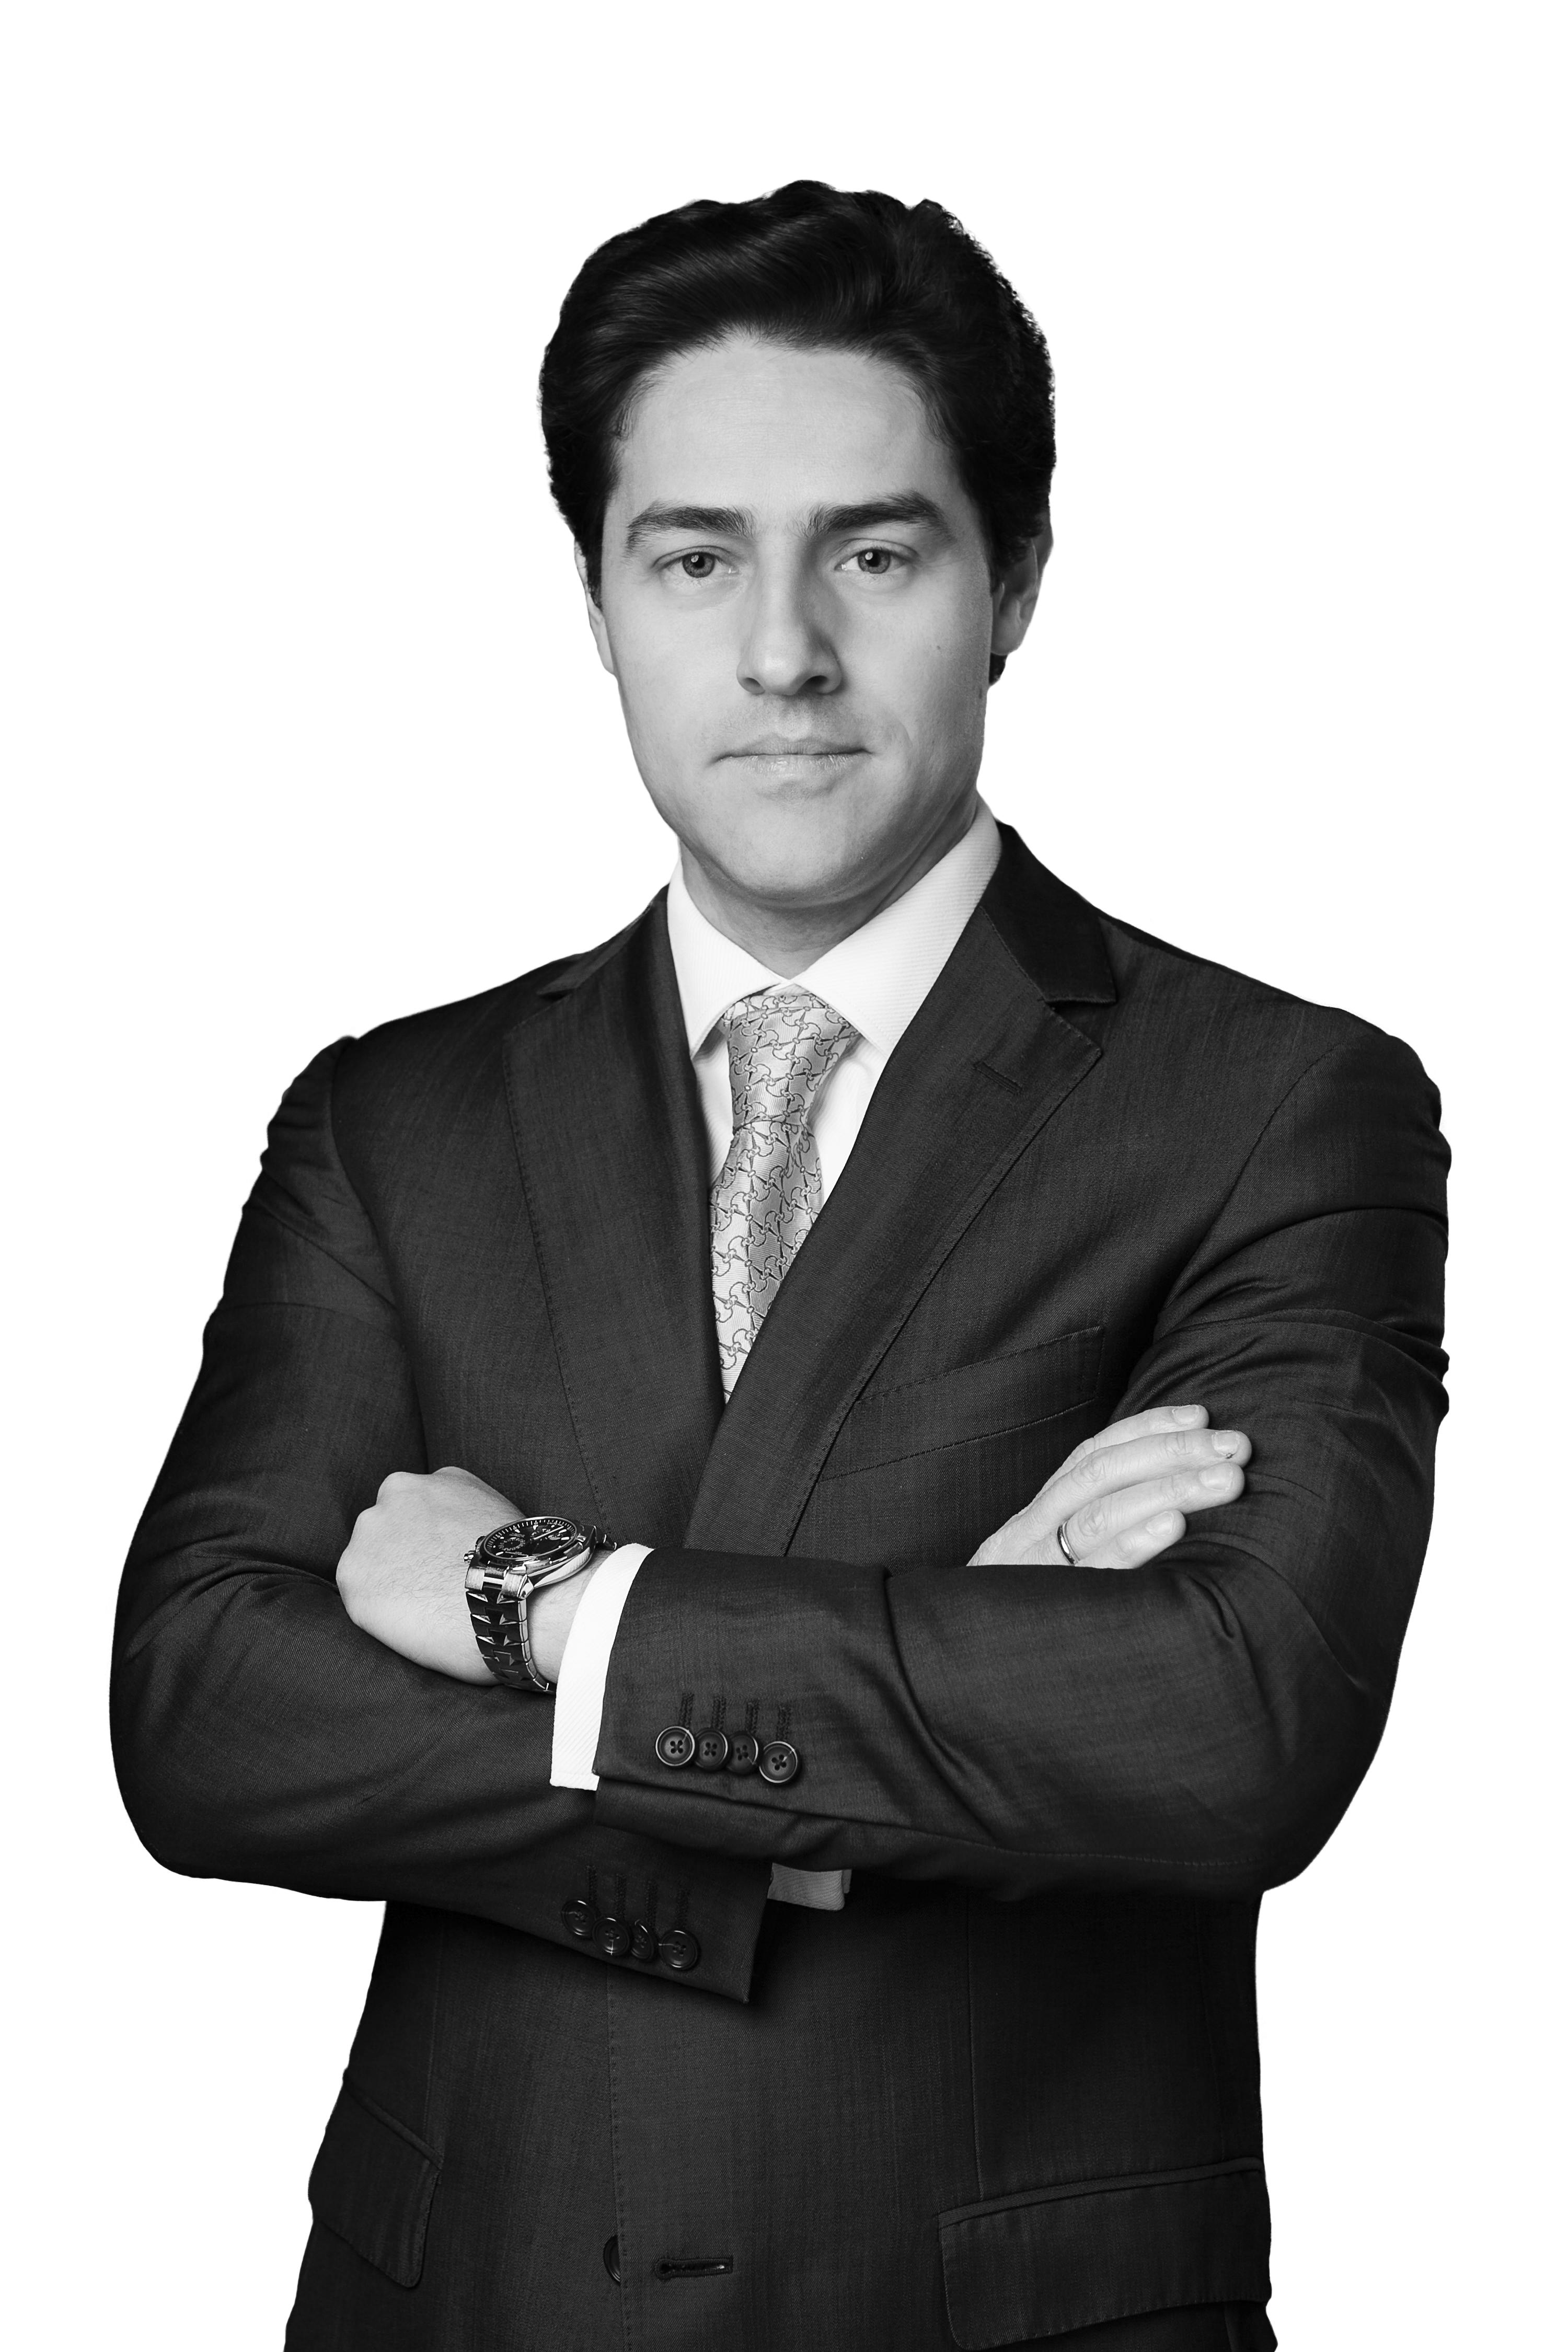 Mattos Filho hires from Pinheiro Neto's insurance practice